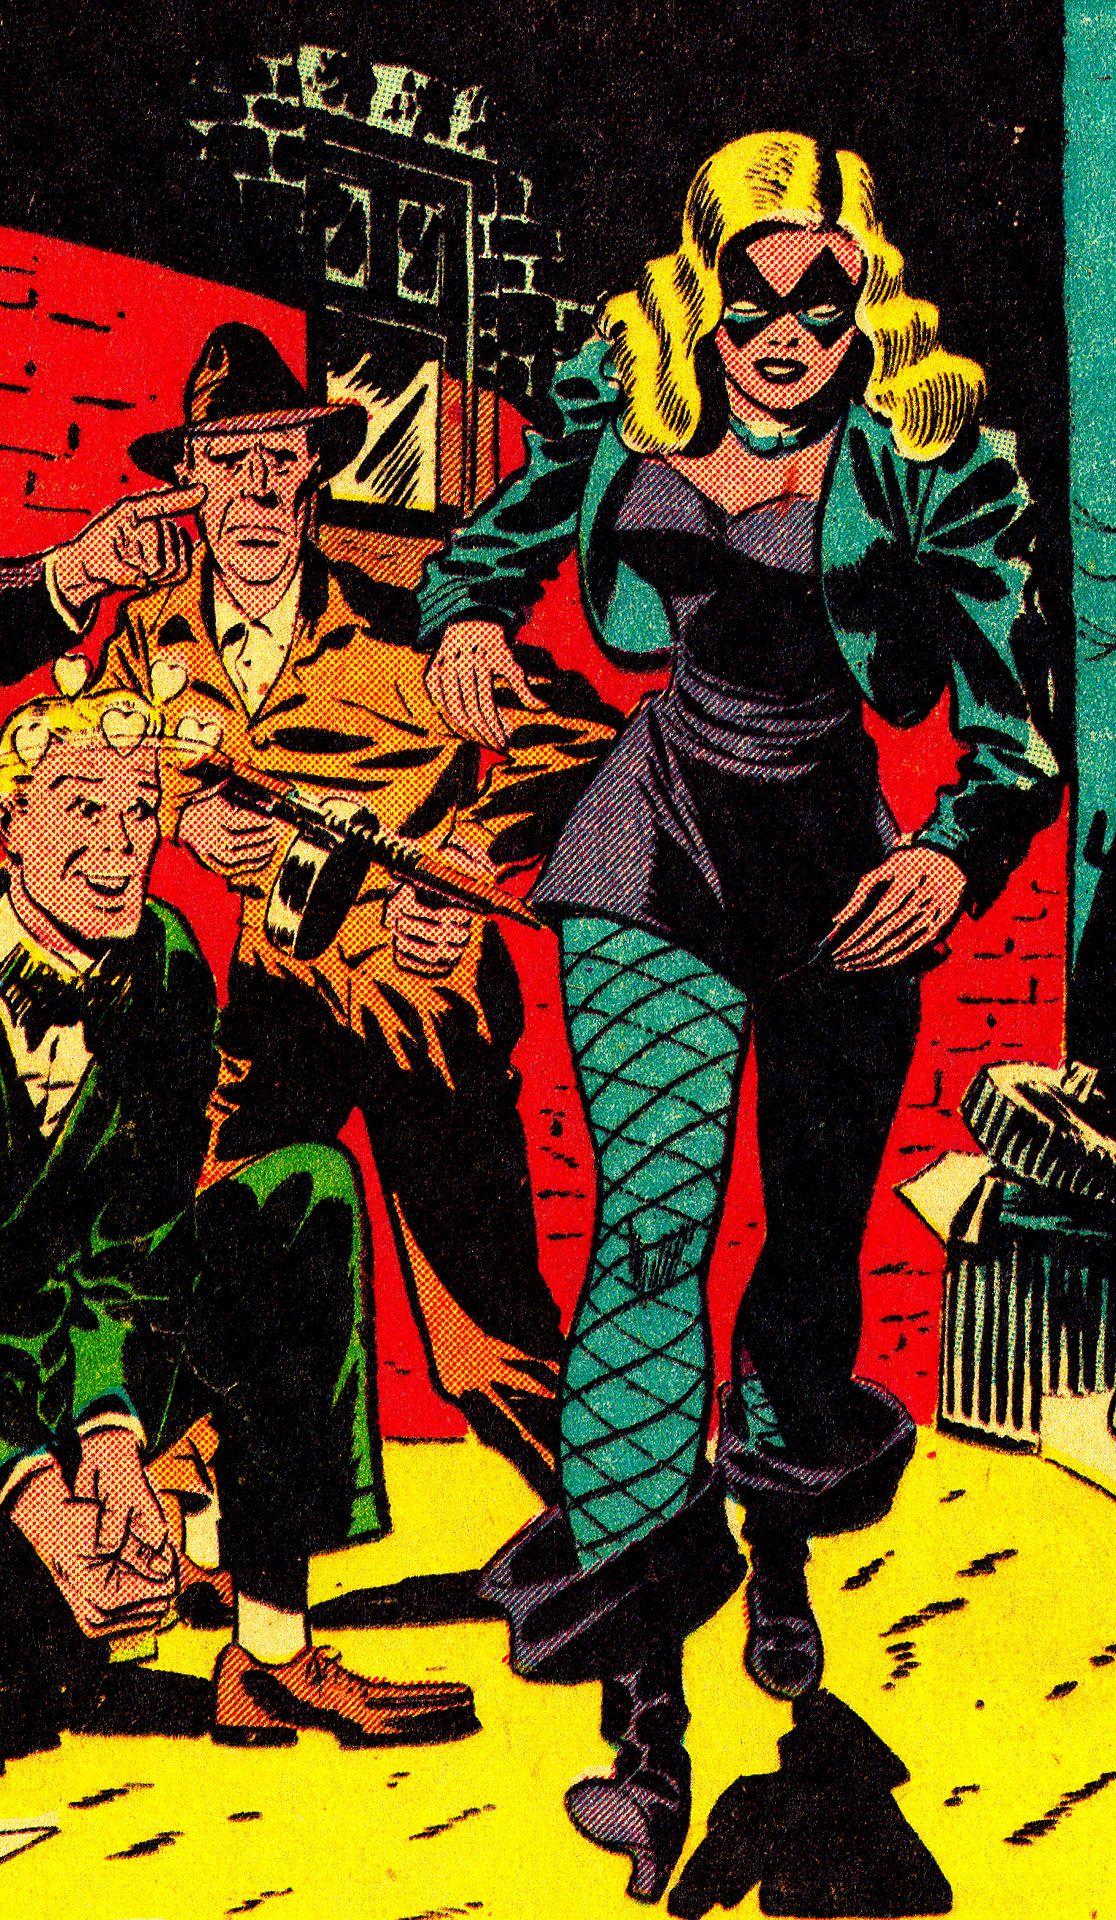 B L A C K C A N A R Y Flash Comics #86 (Aug. 1947) Art by Carmine Infantino (pencils) & Joe Giella (inks)